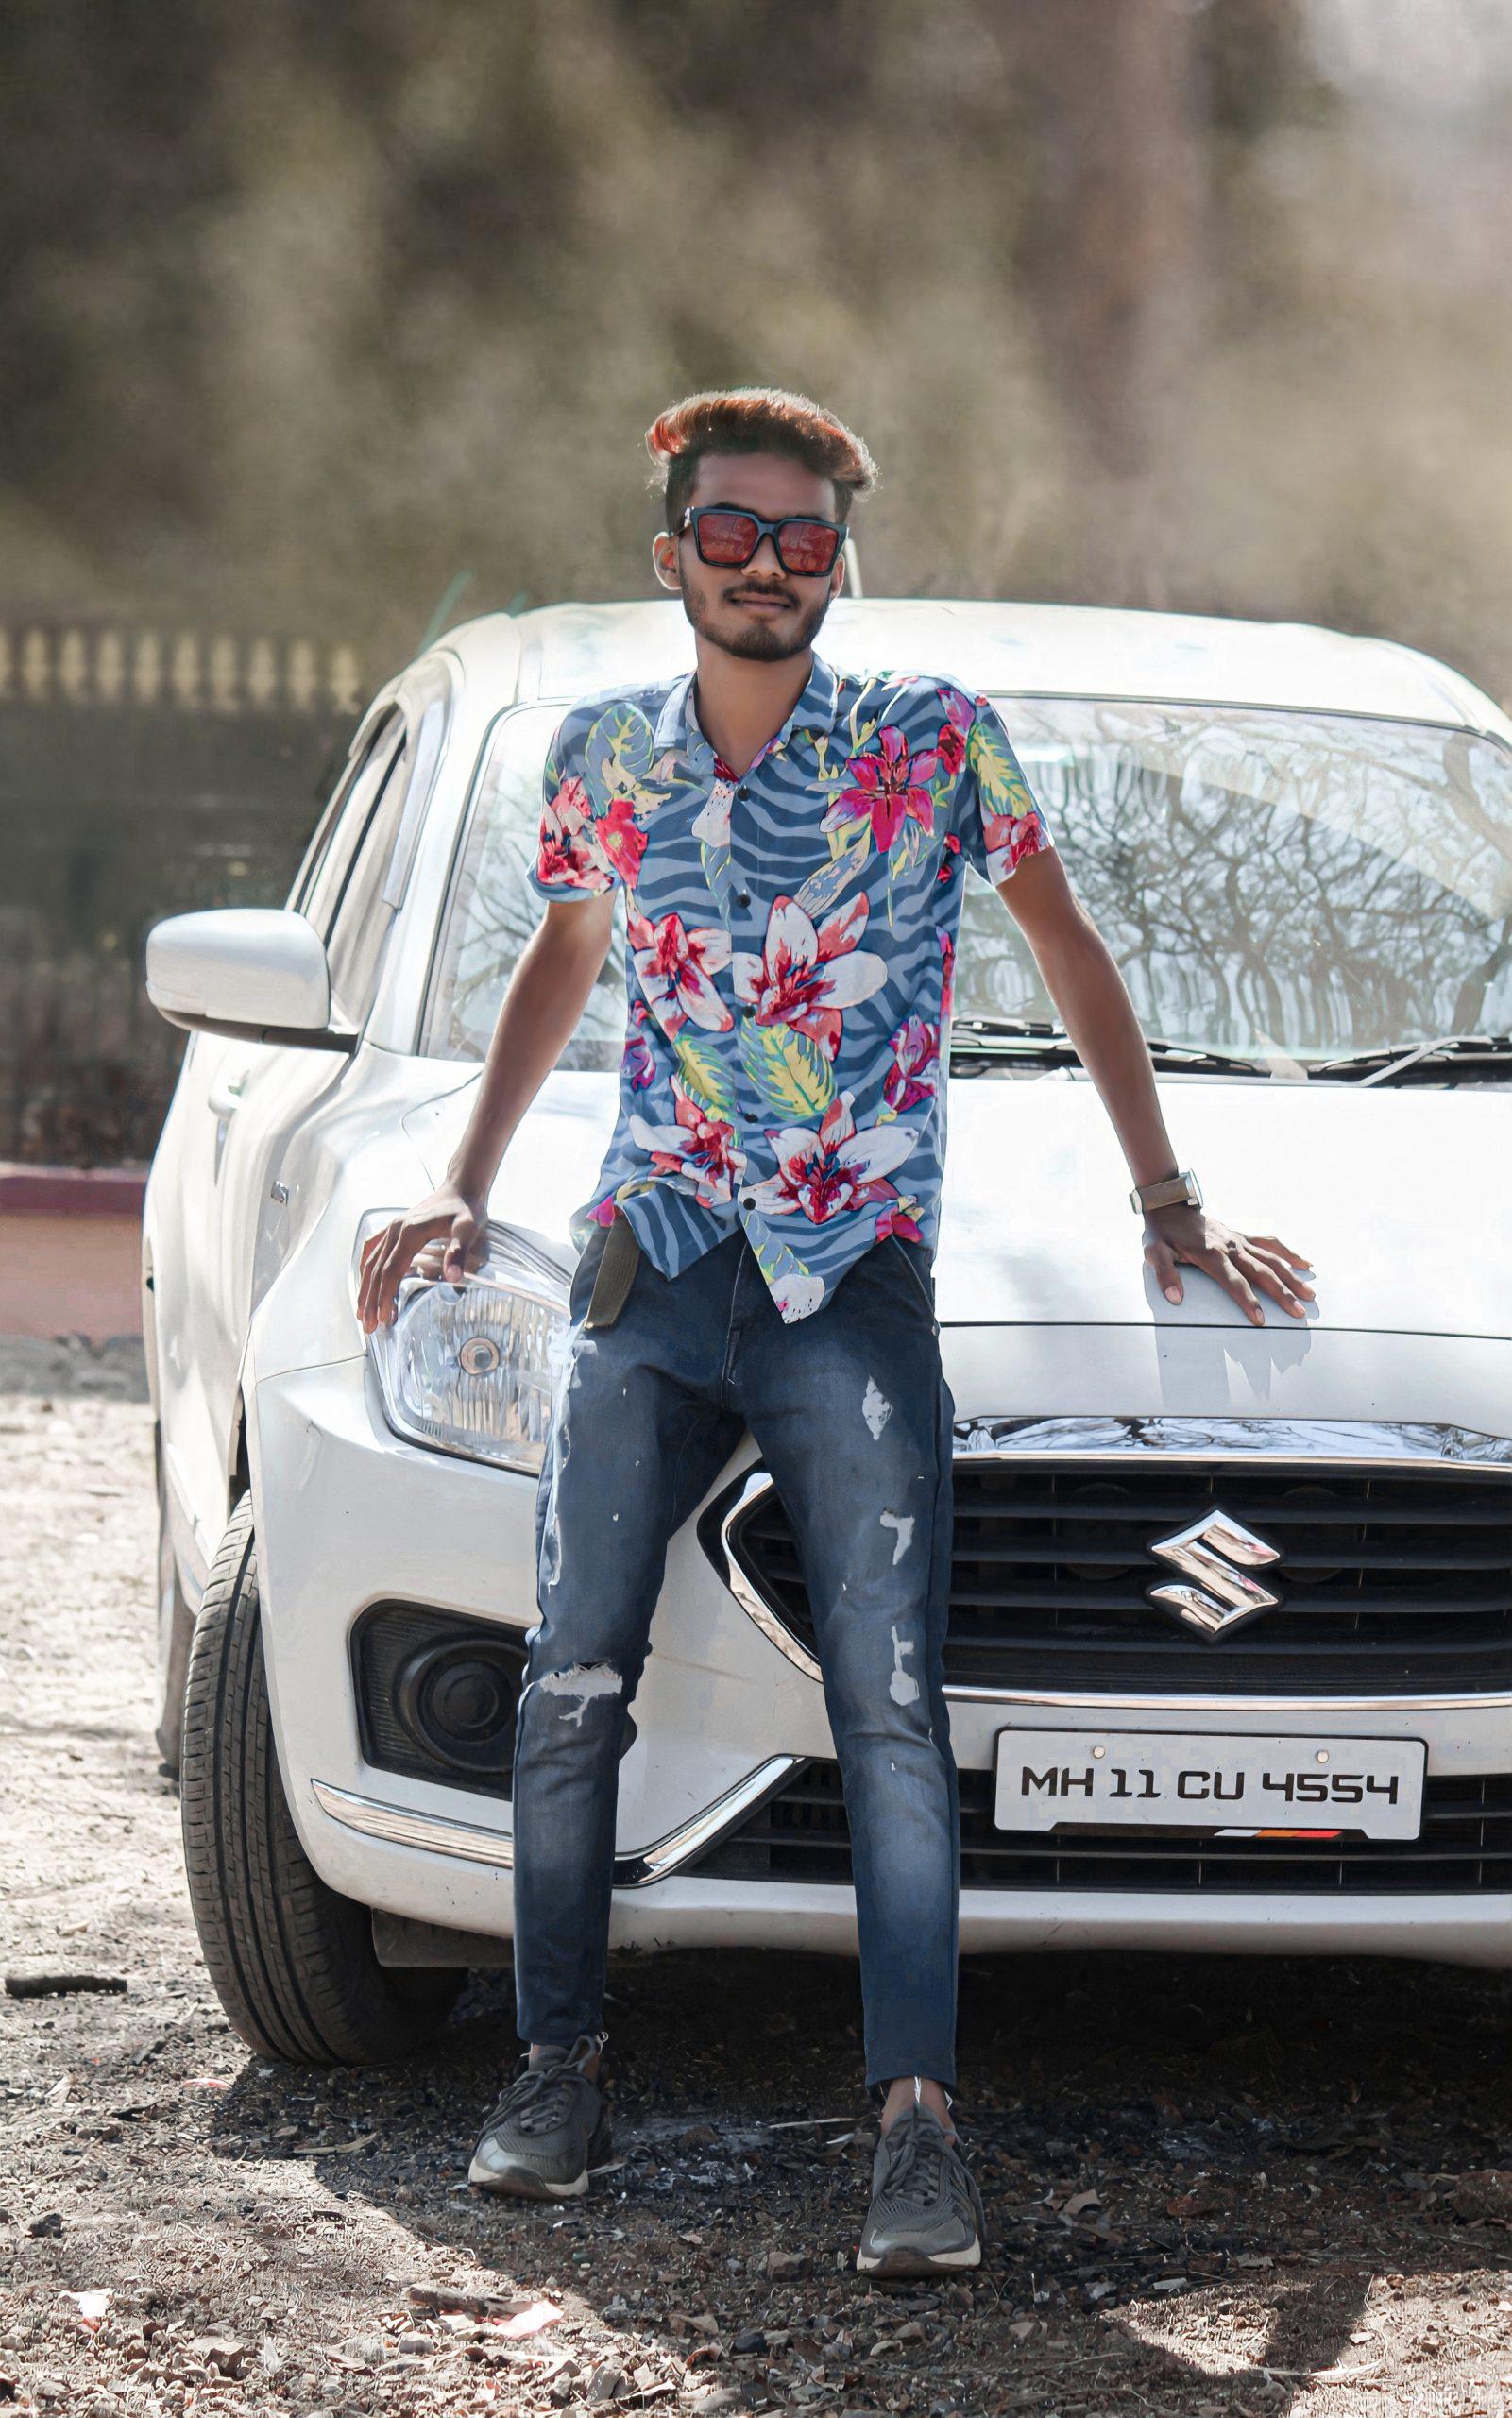 Boy posing in front of car